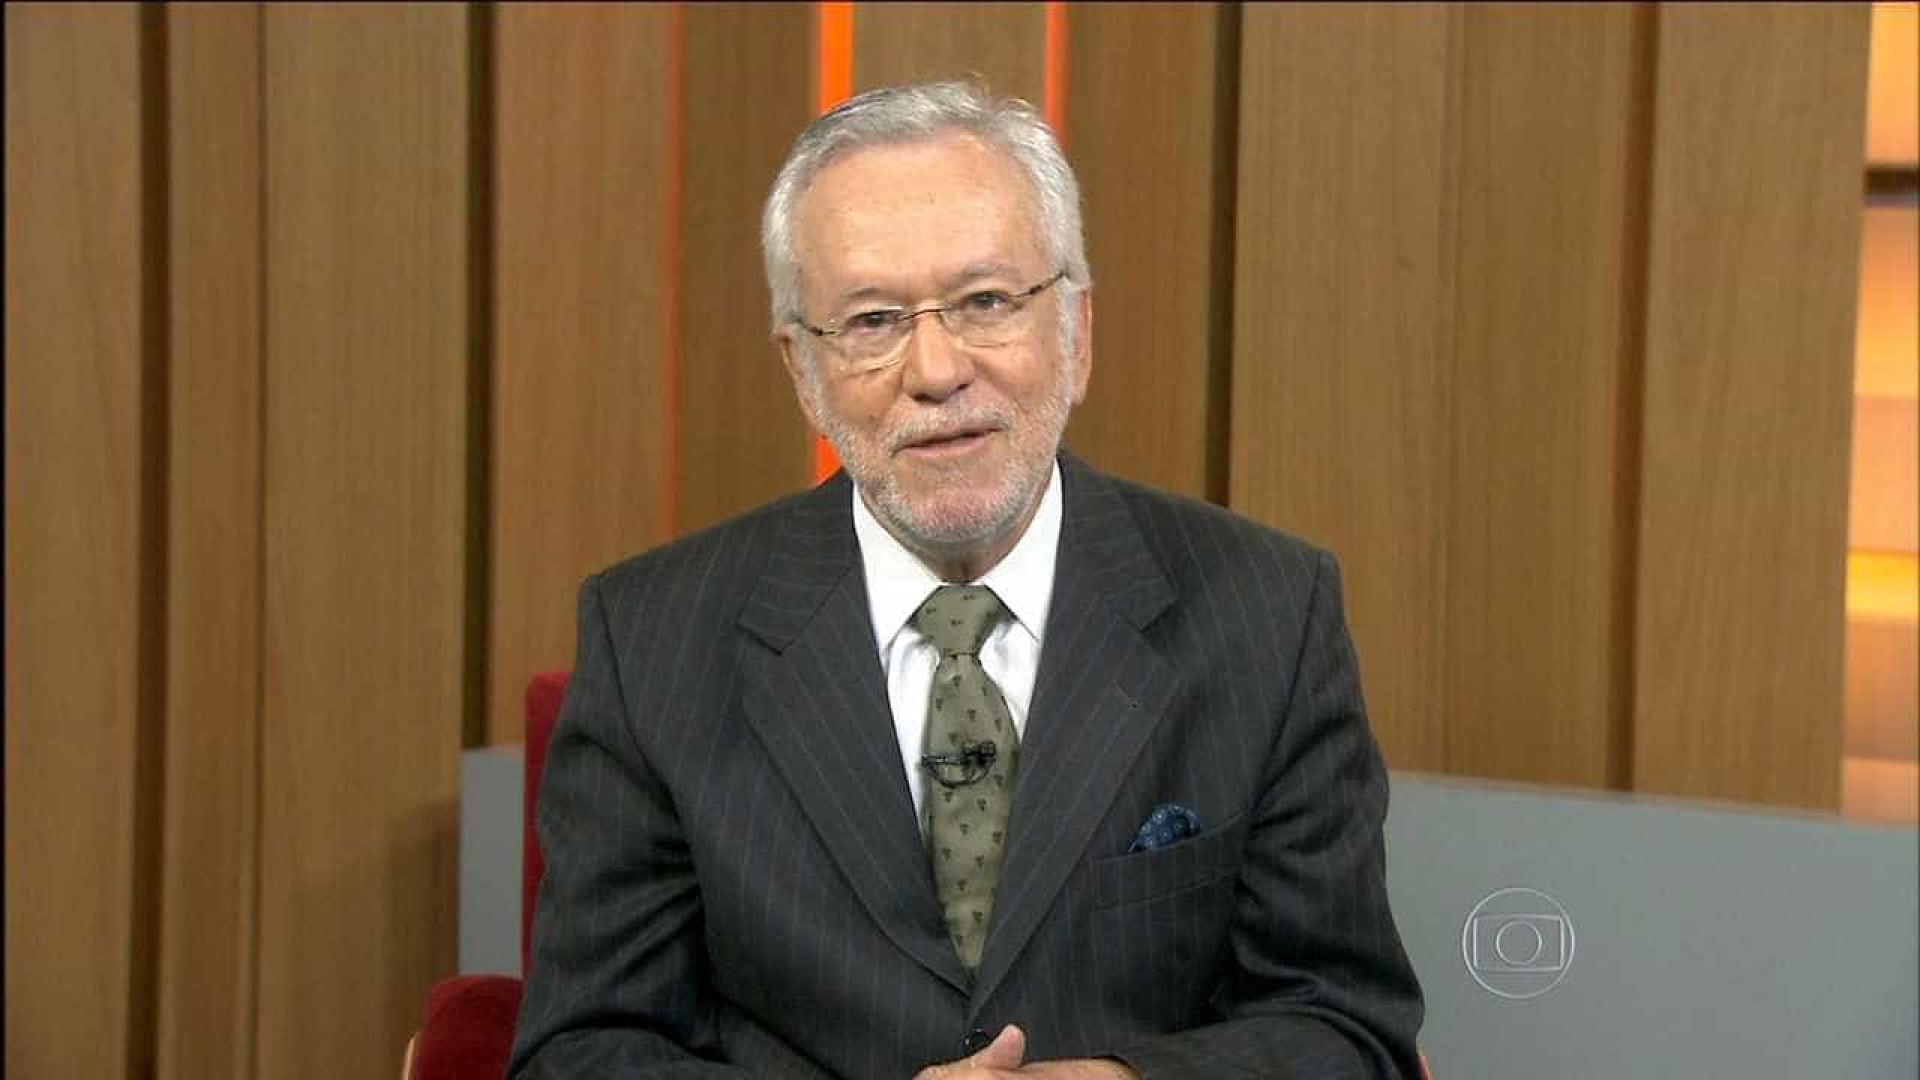 Jornalista Alexandre Garcia deixa TV Globo após 30 anos